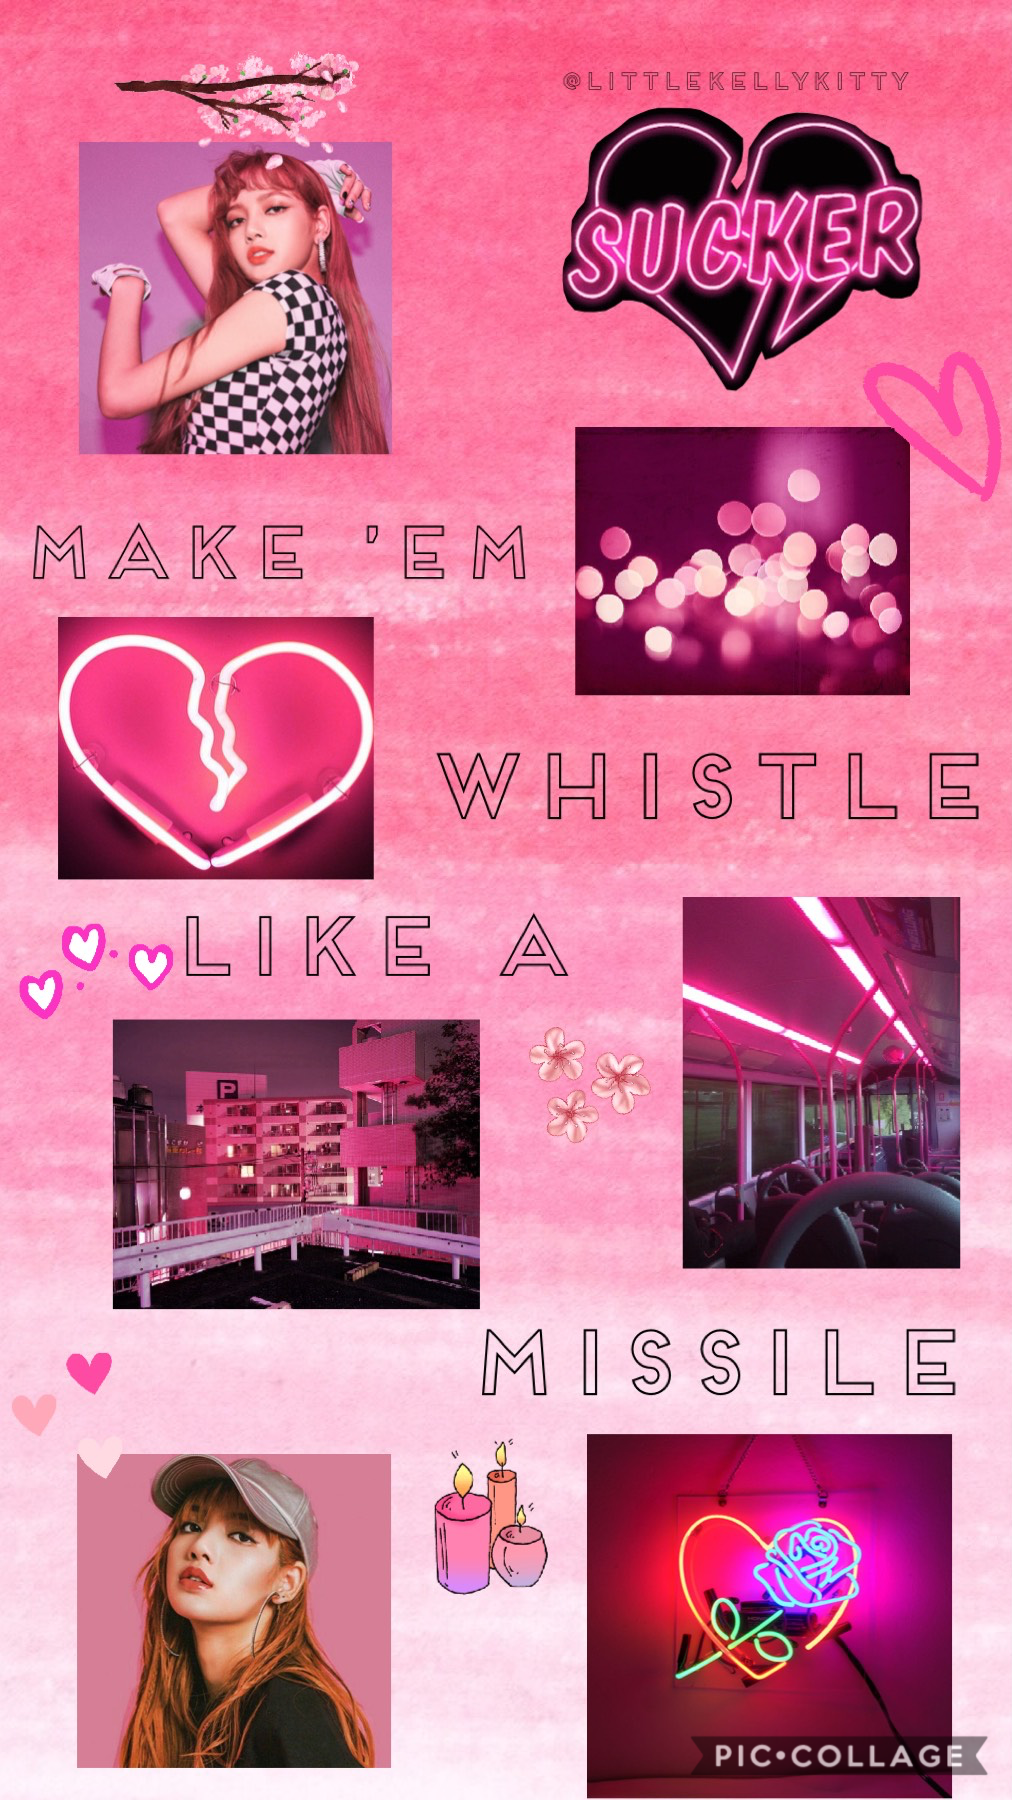 """Make 'em Missile like a Whistle...Bomb Bomb."""